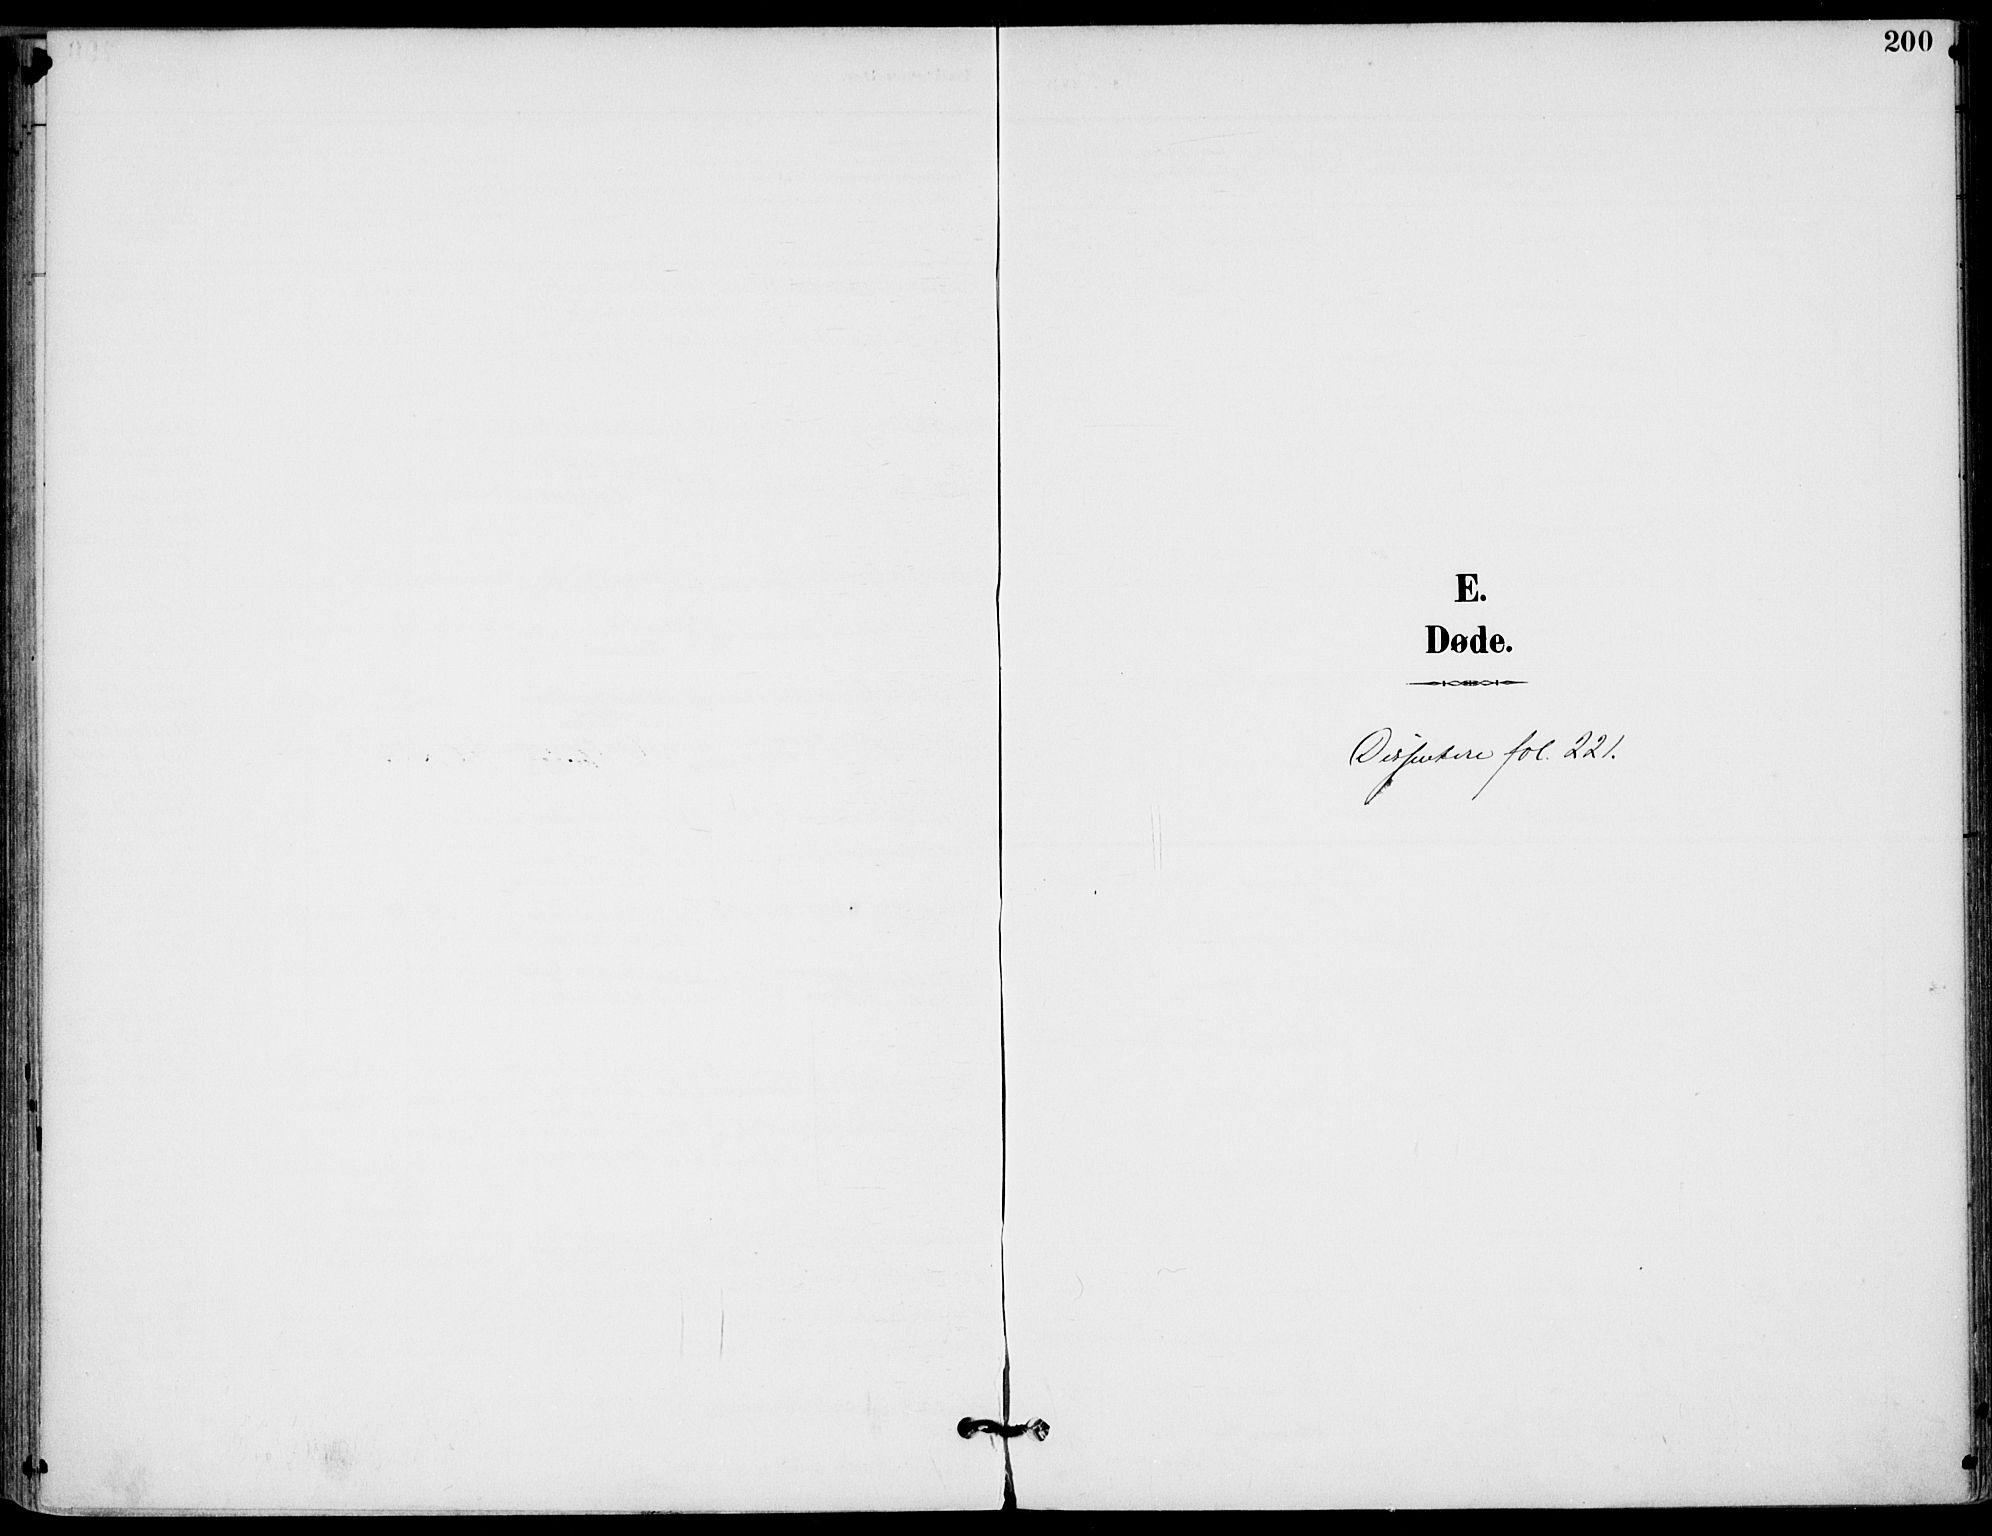 SAKO, Drangedal kirkebøker, F/Fa/L0012: Ministerialbok nr. 12, 1895-1905, s. 200